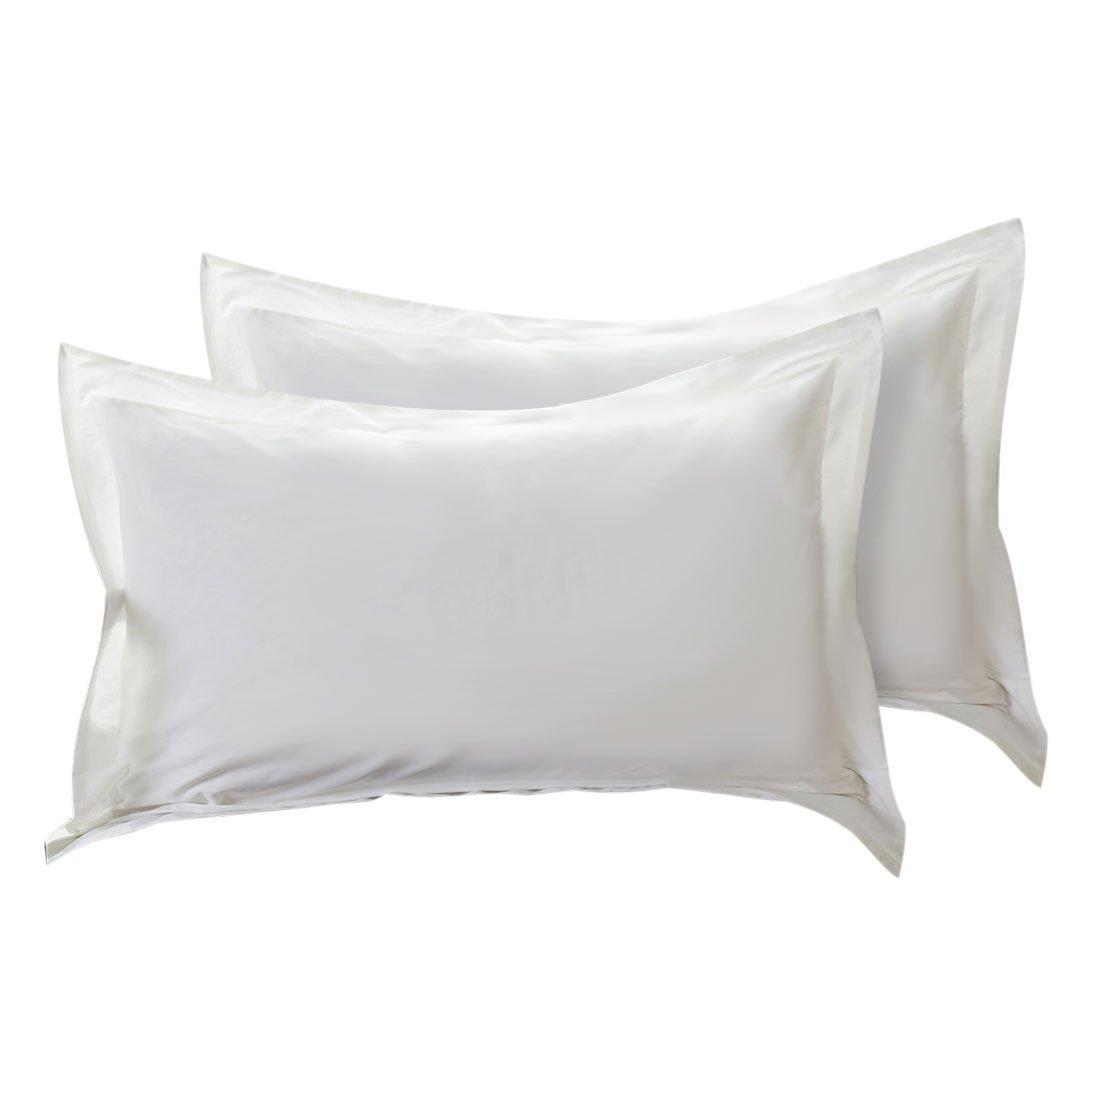 Mayfair Linen European Square Pillow Shams Set of 2 White 600 Thread Count 100/% Egyptian Cotton PACK OF 2 Euro 26 x 26 Bright WHITE Pillow shams Cushion Cover Cases Super Soft Decorative sham-26x26-white